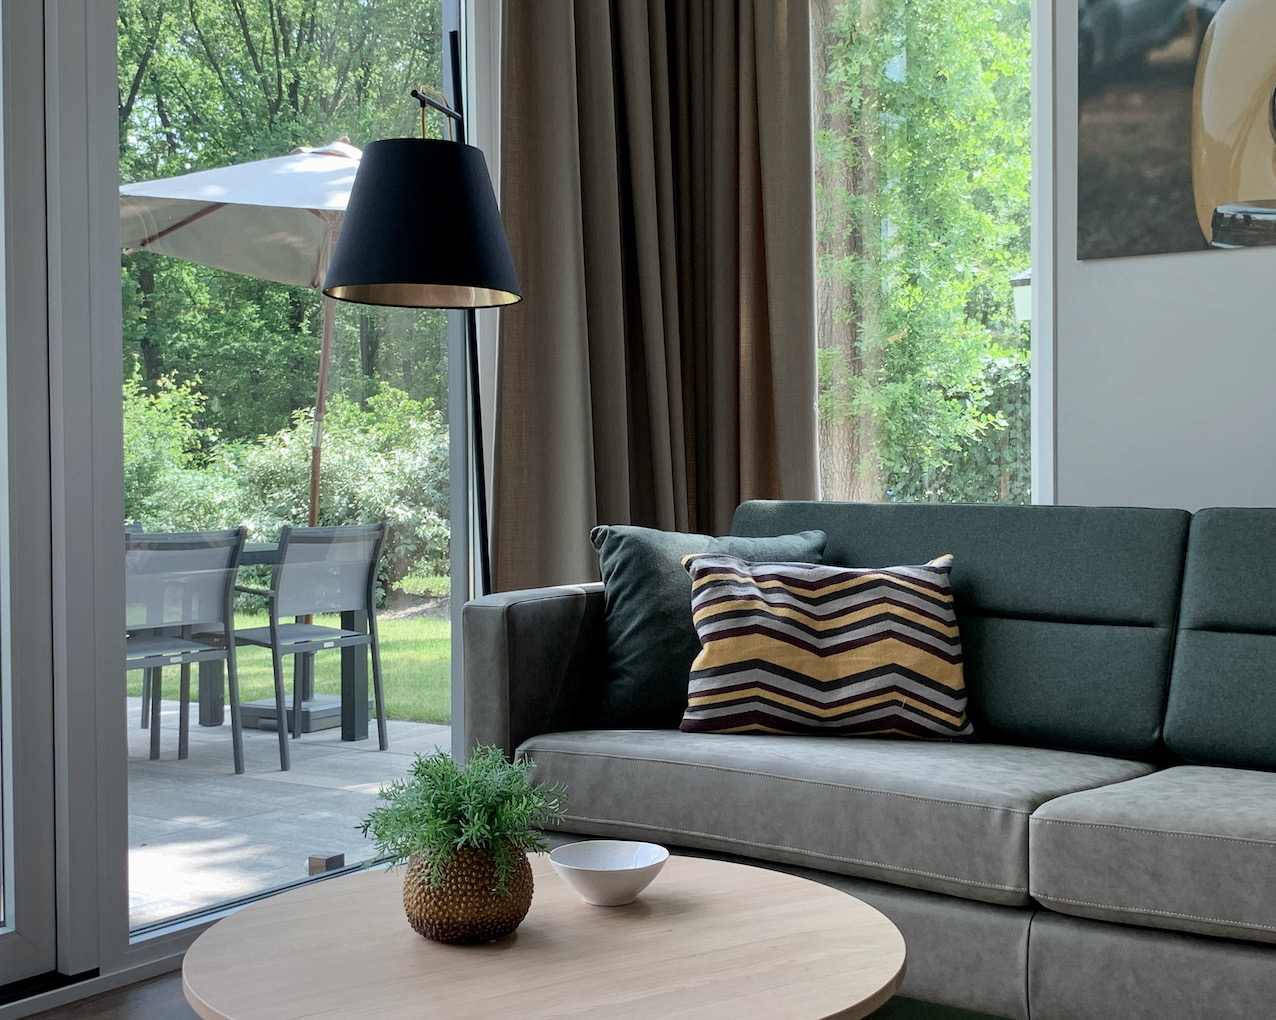 https://wellnessvakantieveluwe.nl/wp-content/uploads/2021/06/Living.jpeg